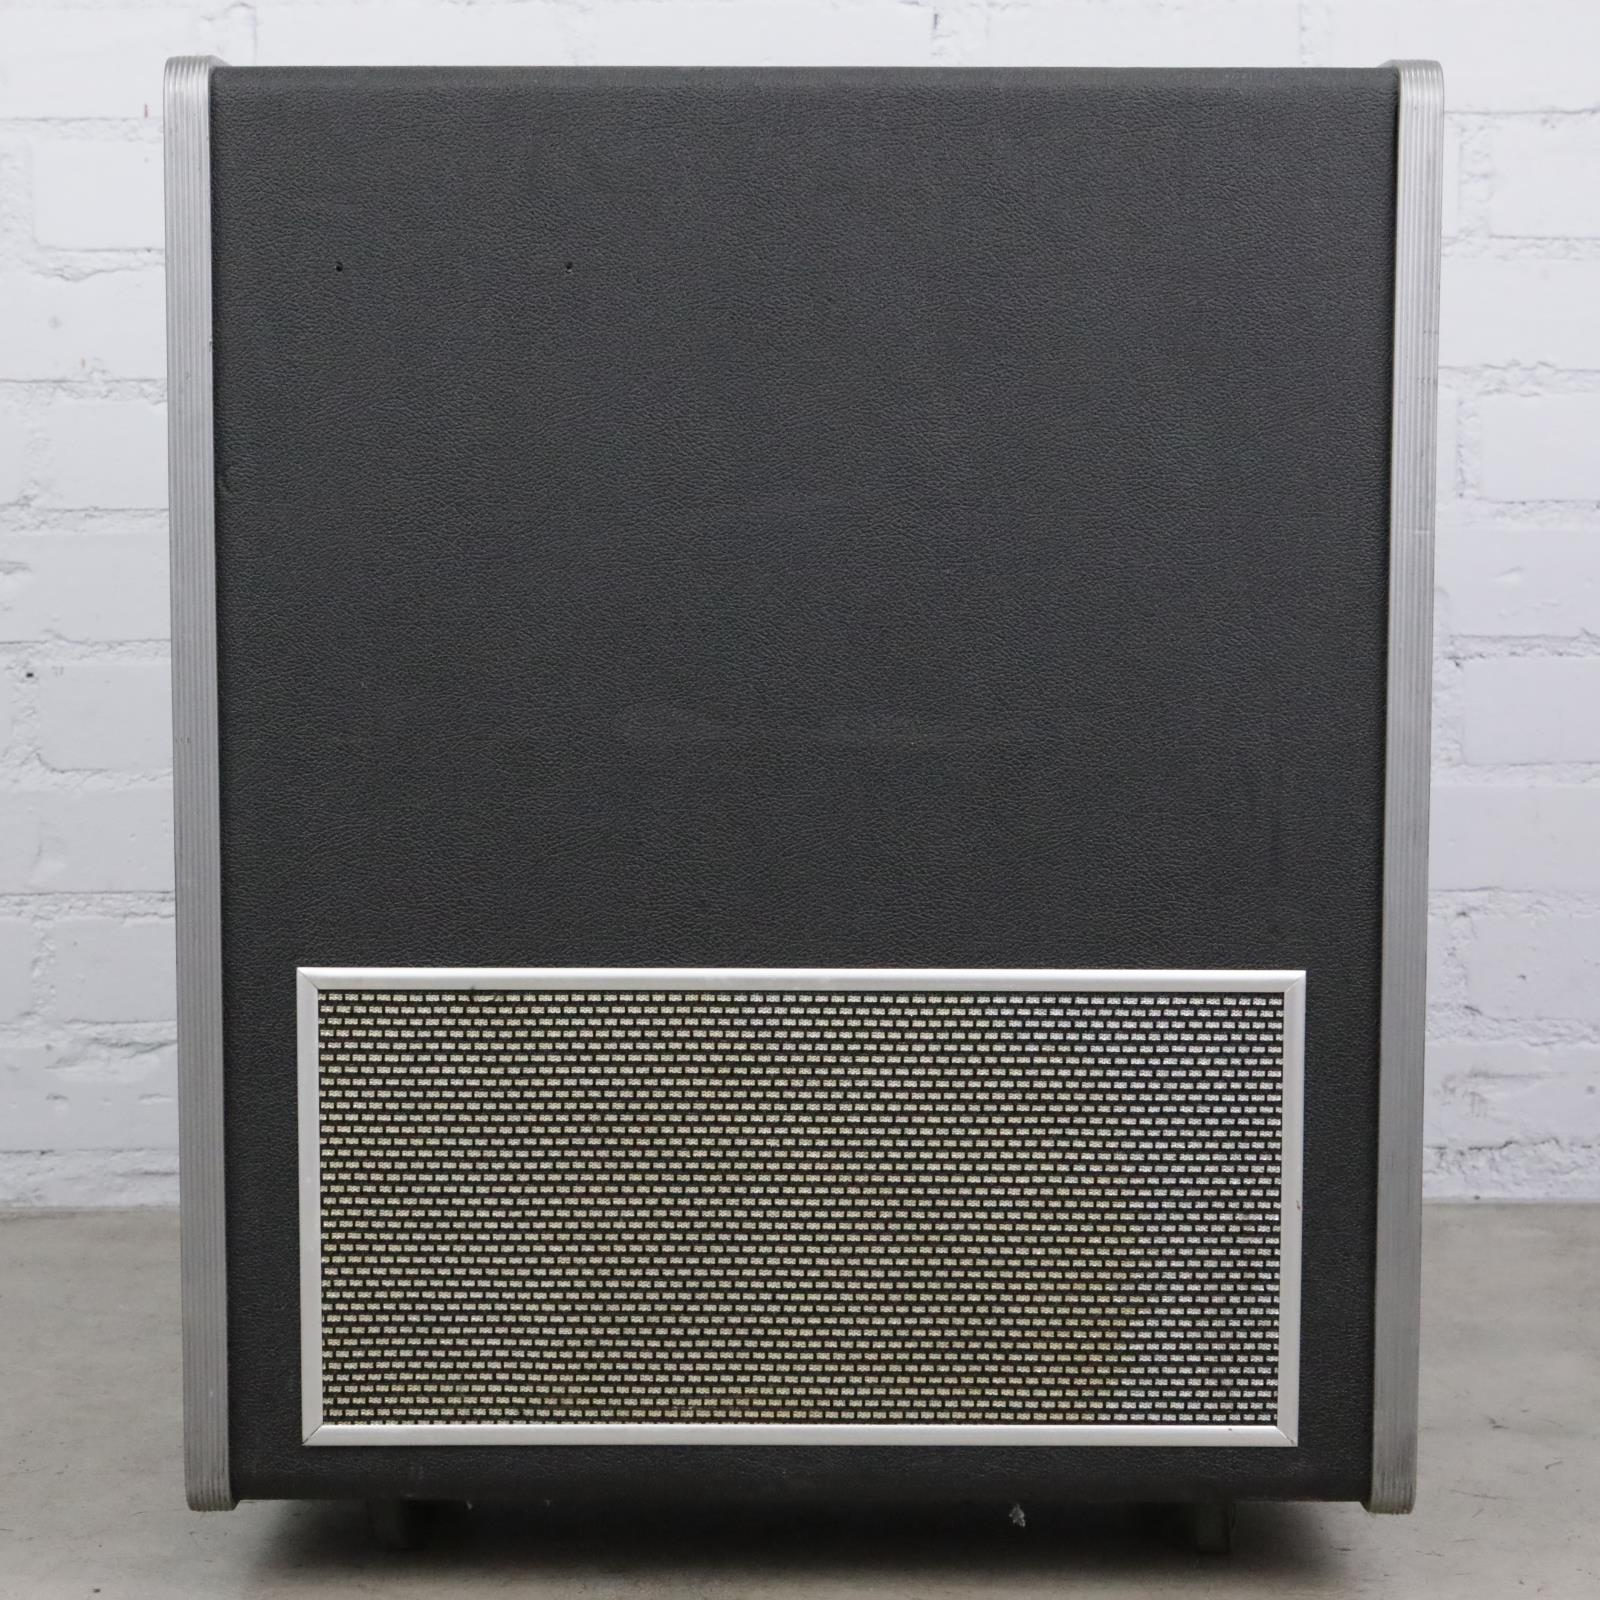 Leslie 825 Speaker Cabinet On Wheels #40102